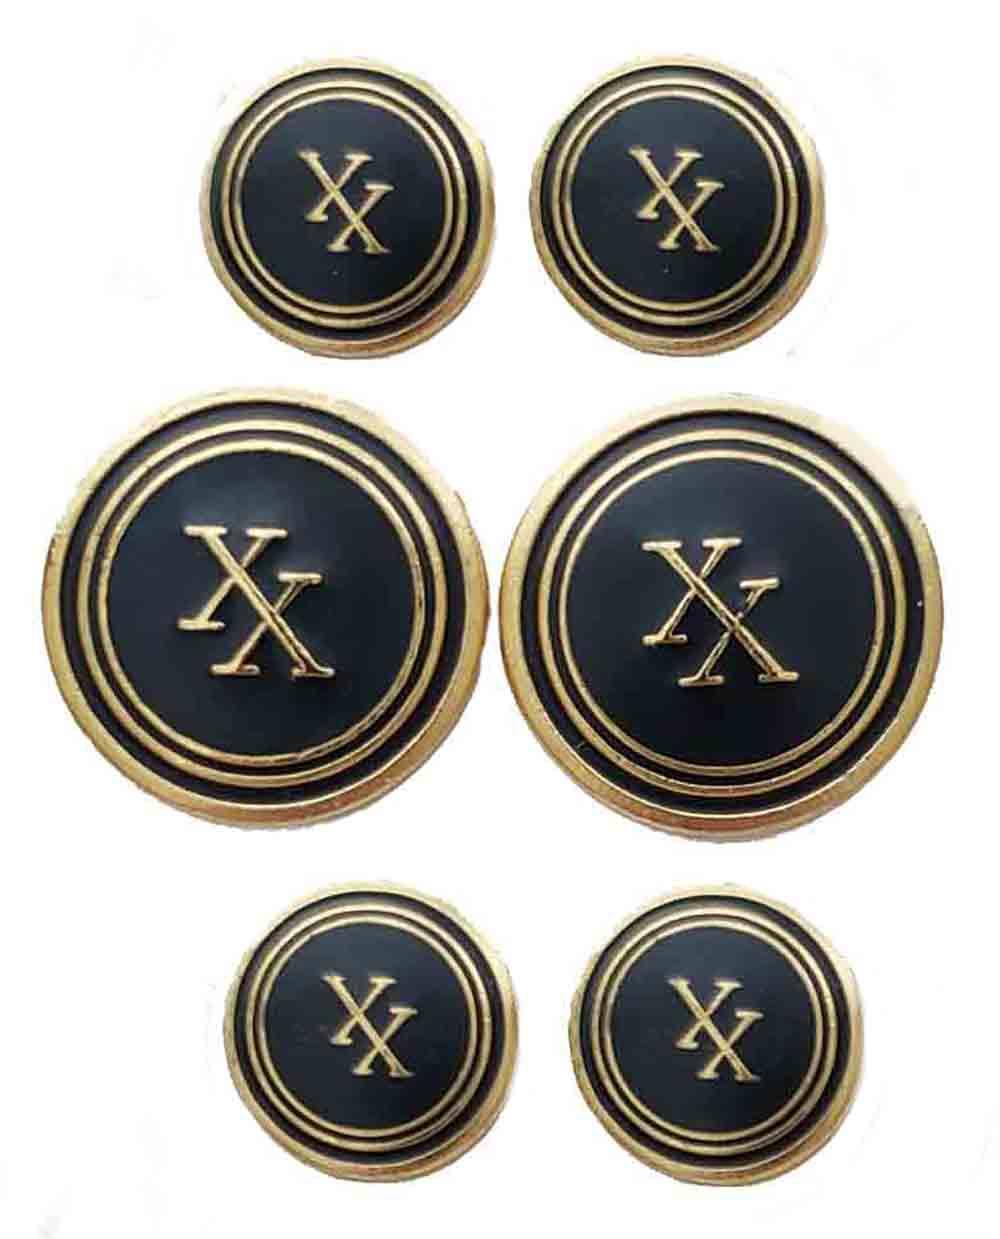 Vintage Oxford for Neiman Marcus Blazer Buttons Brass Enamel Gold Black XX Monogram Men's